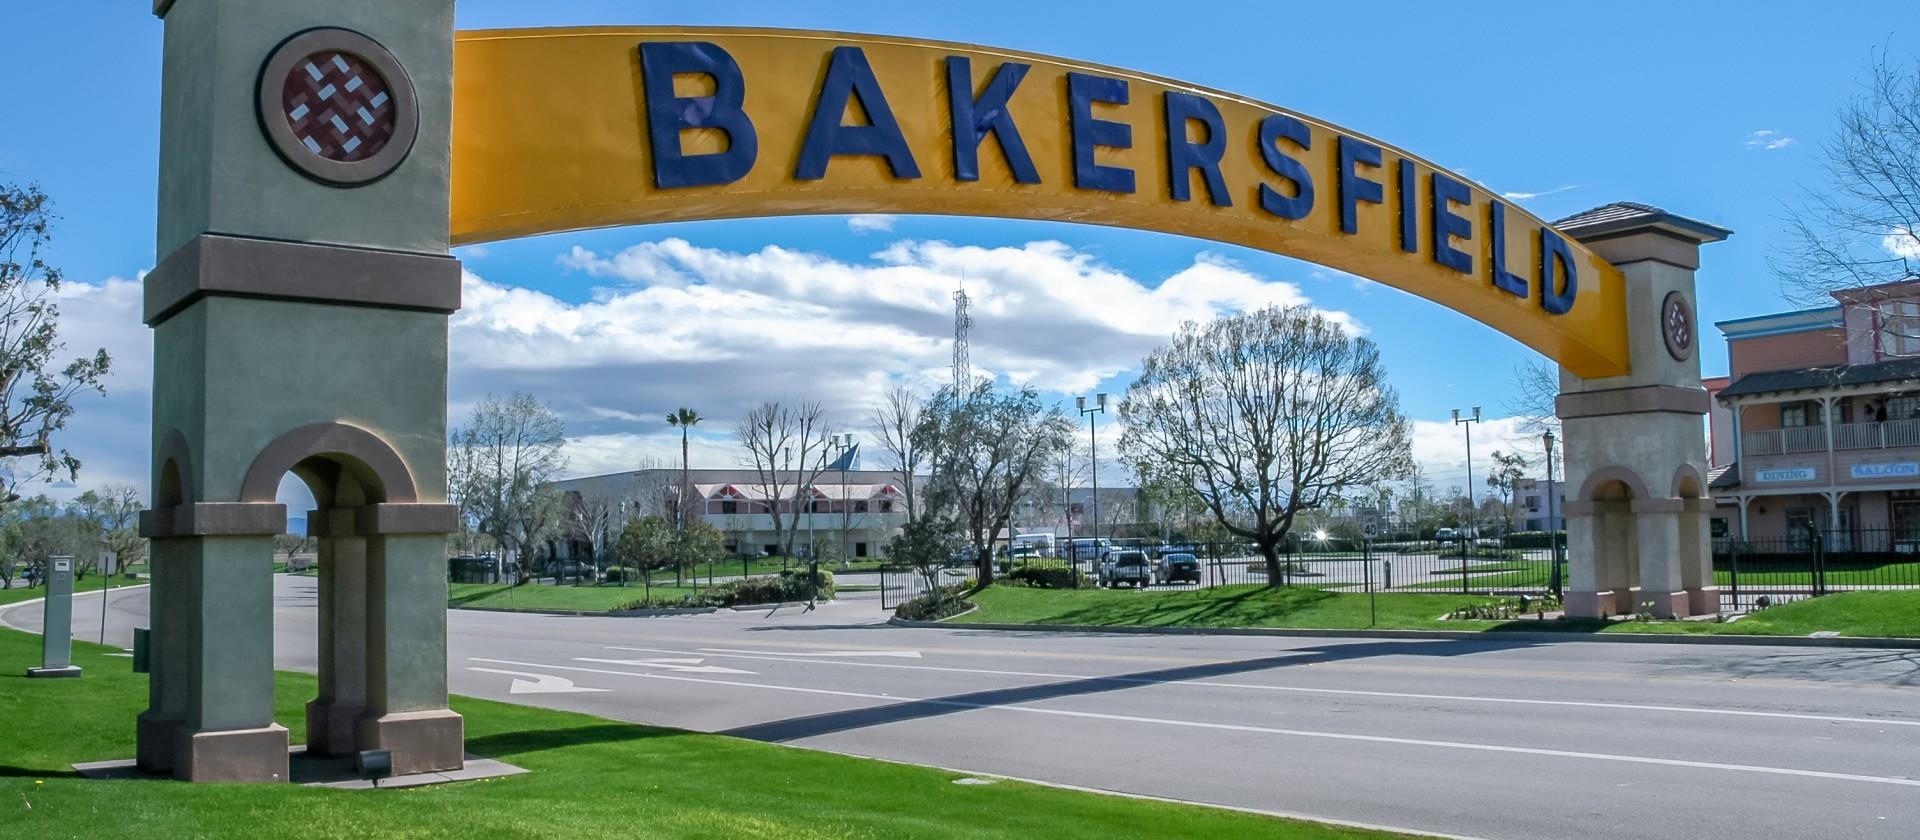 Discrete STD Testing in Bakersfield, CA